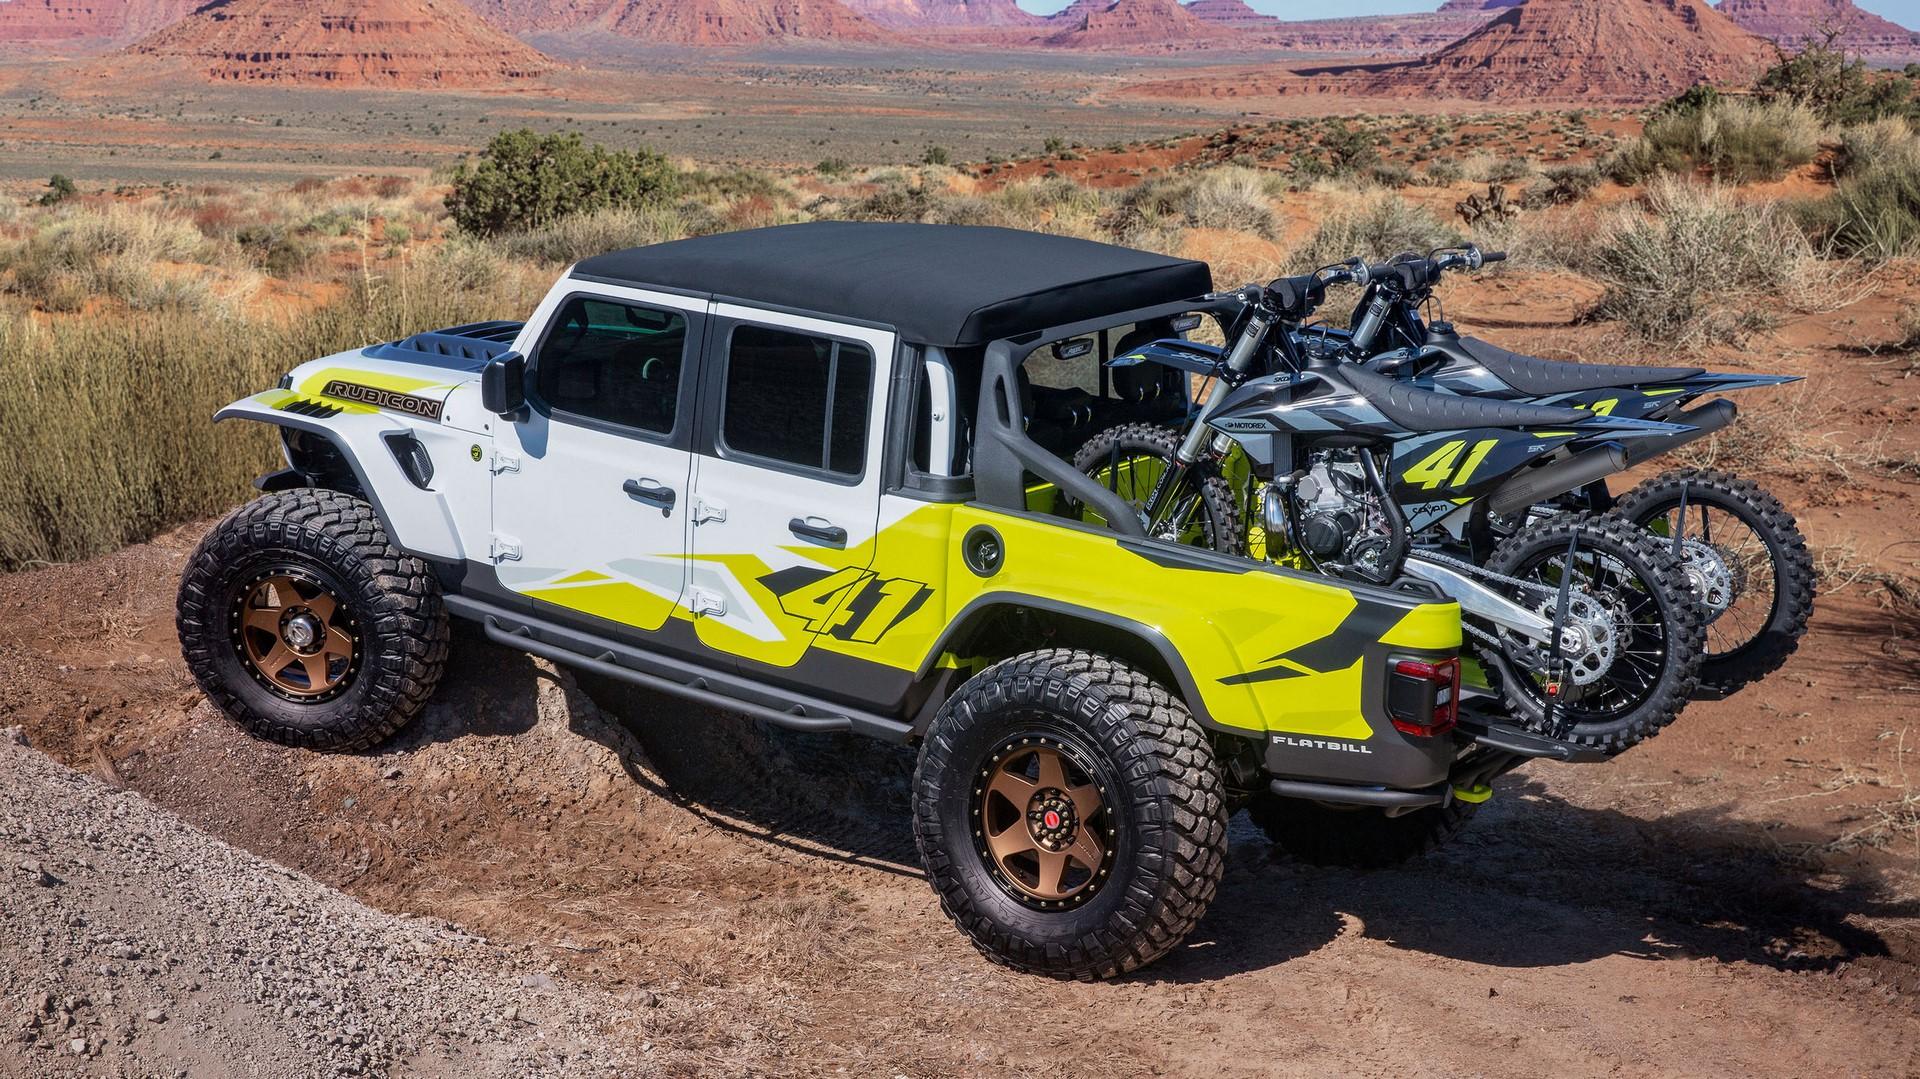 jeep-flatbill-concept-1-1